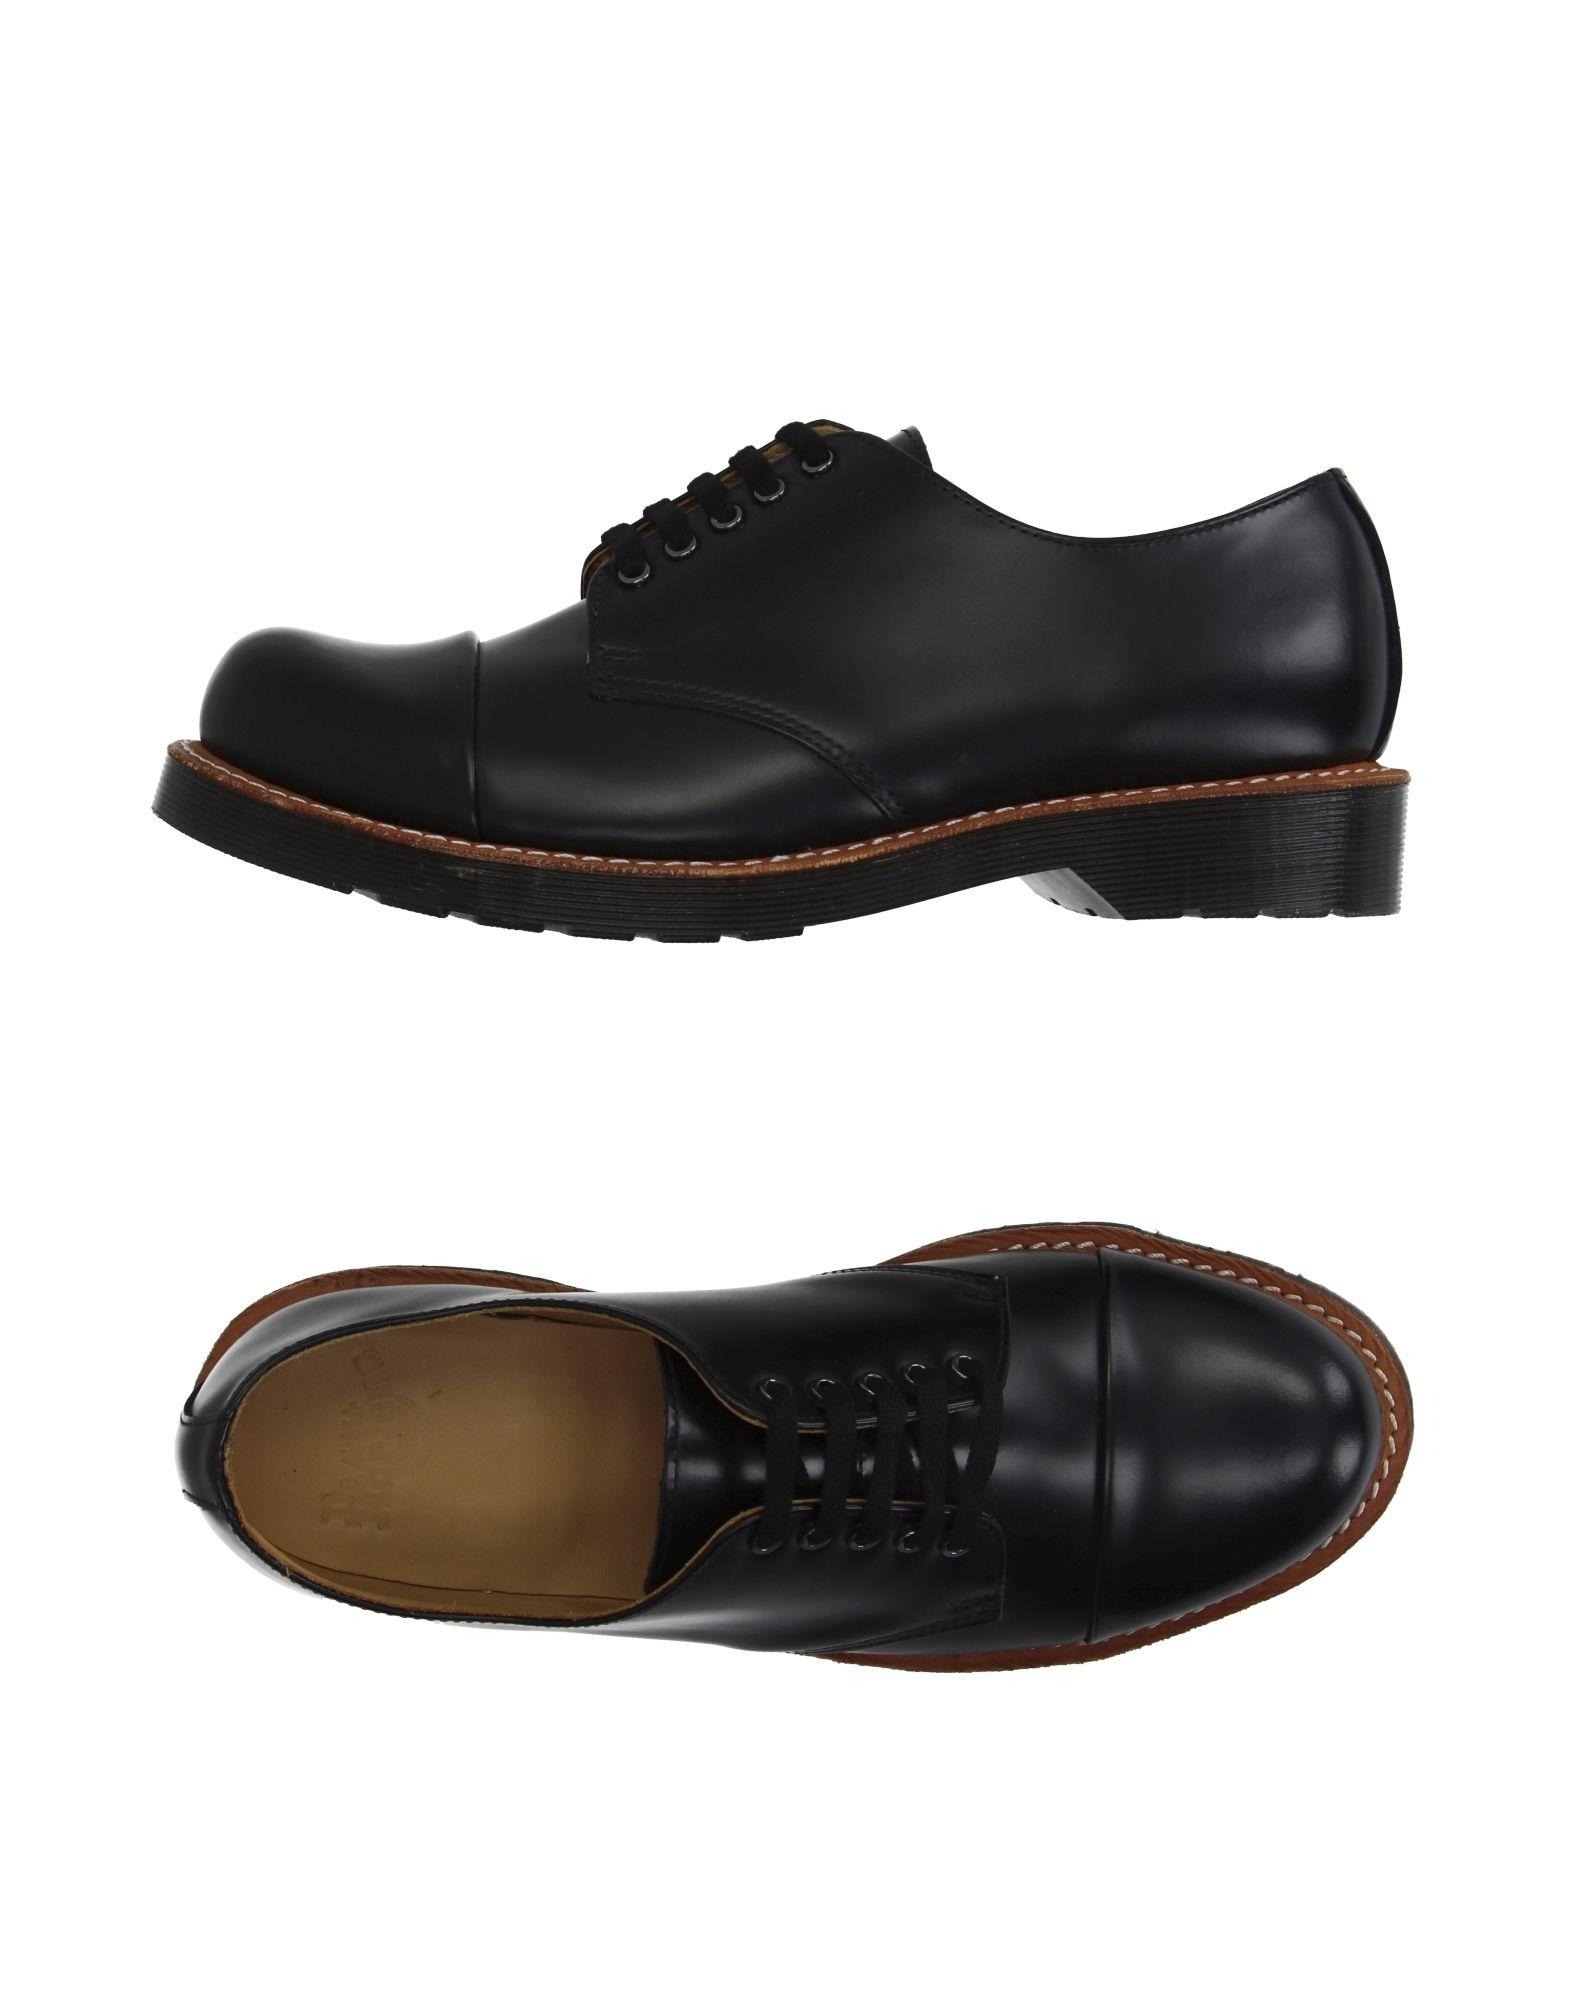 Dr. Martens Schnürschuhe Herren  11017909EK Gute Qualität beliebte Schuhe